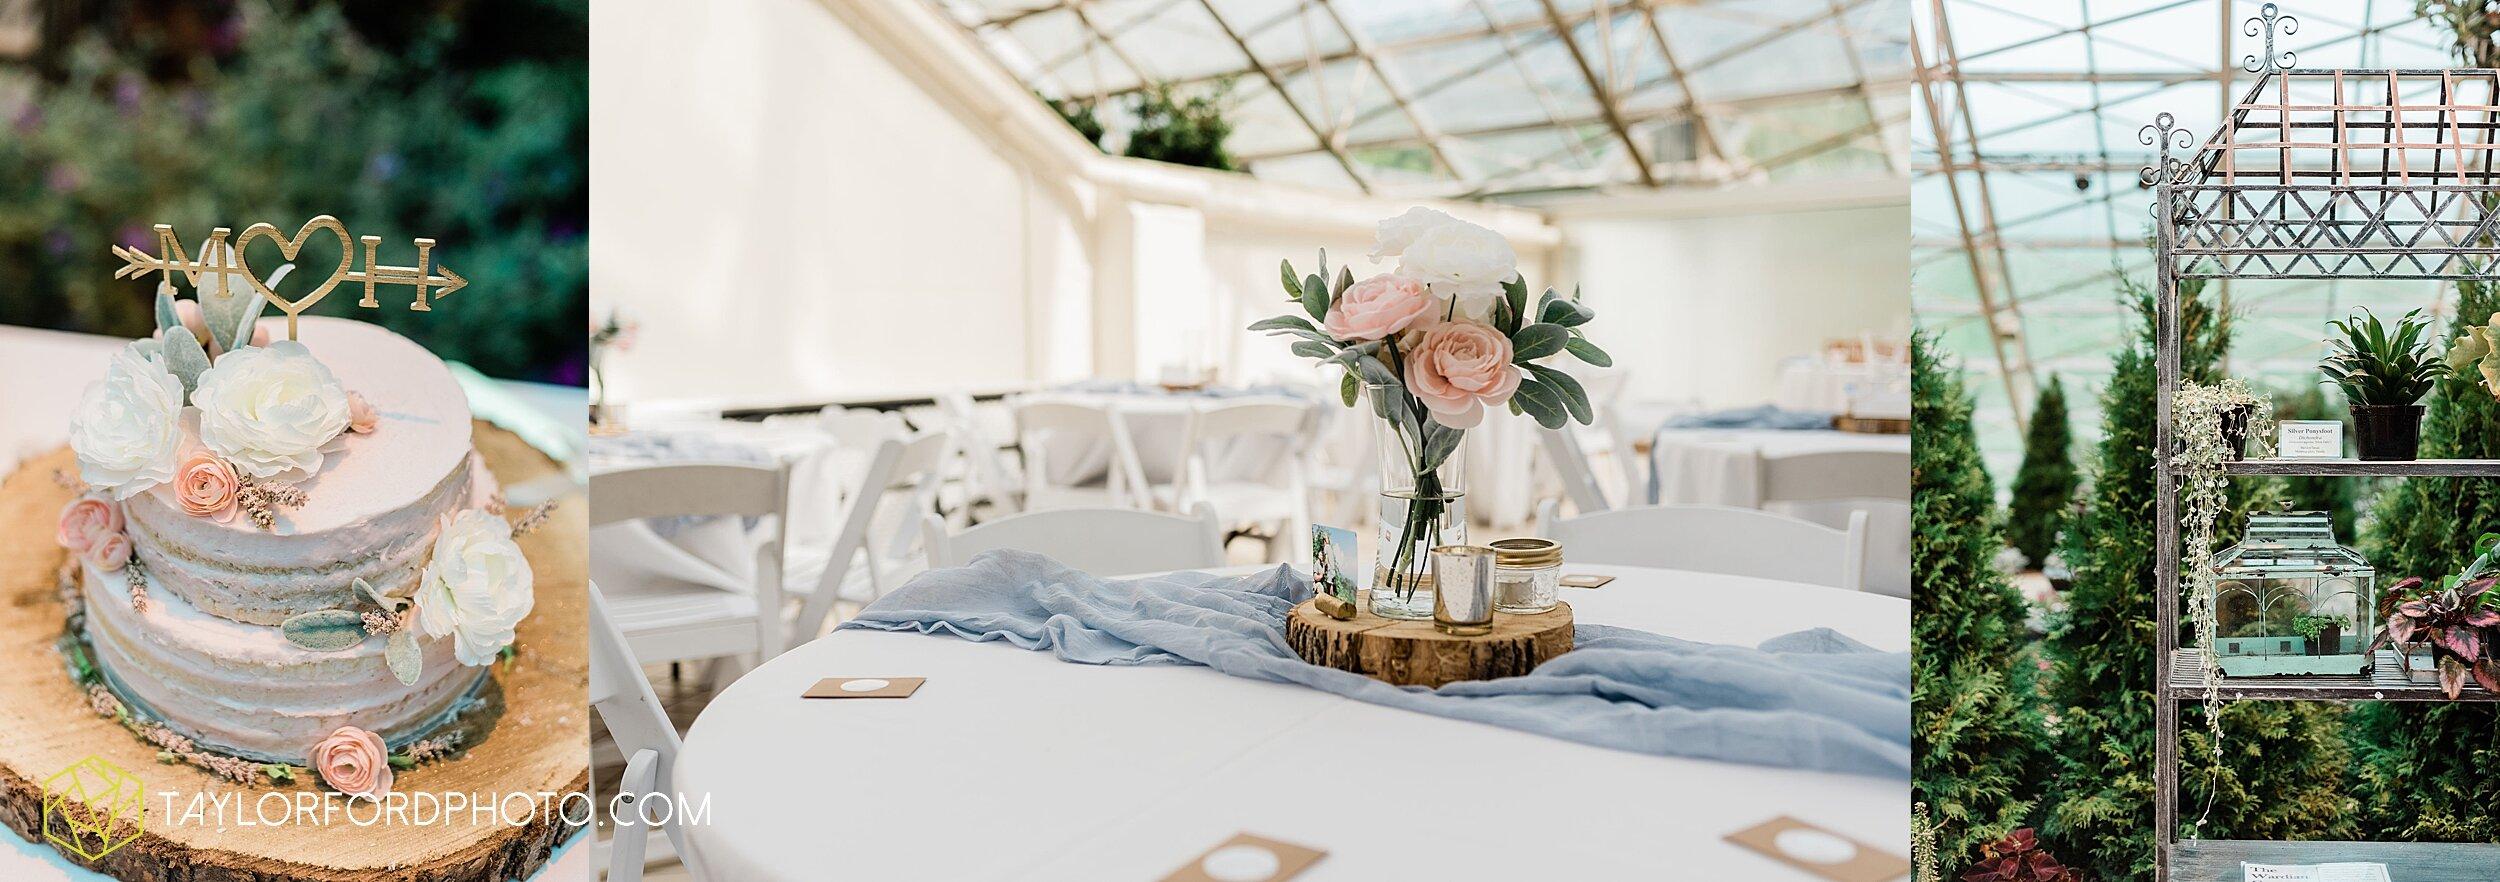 wedding venues northwest indiana